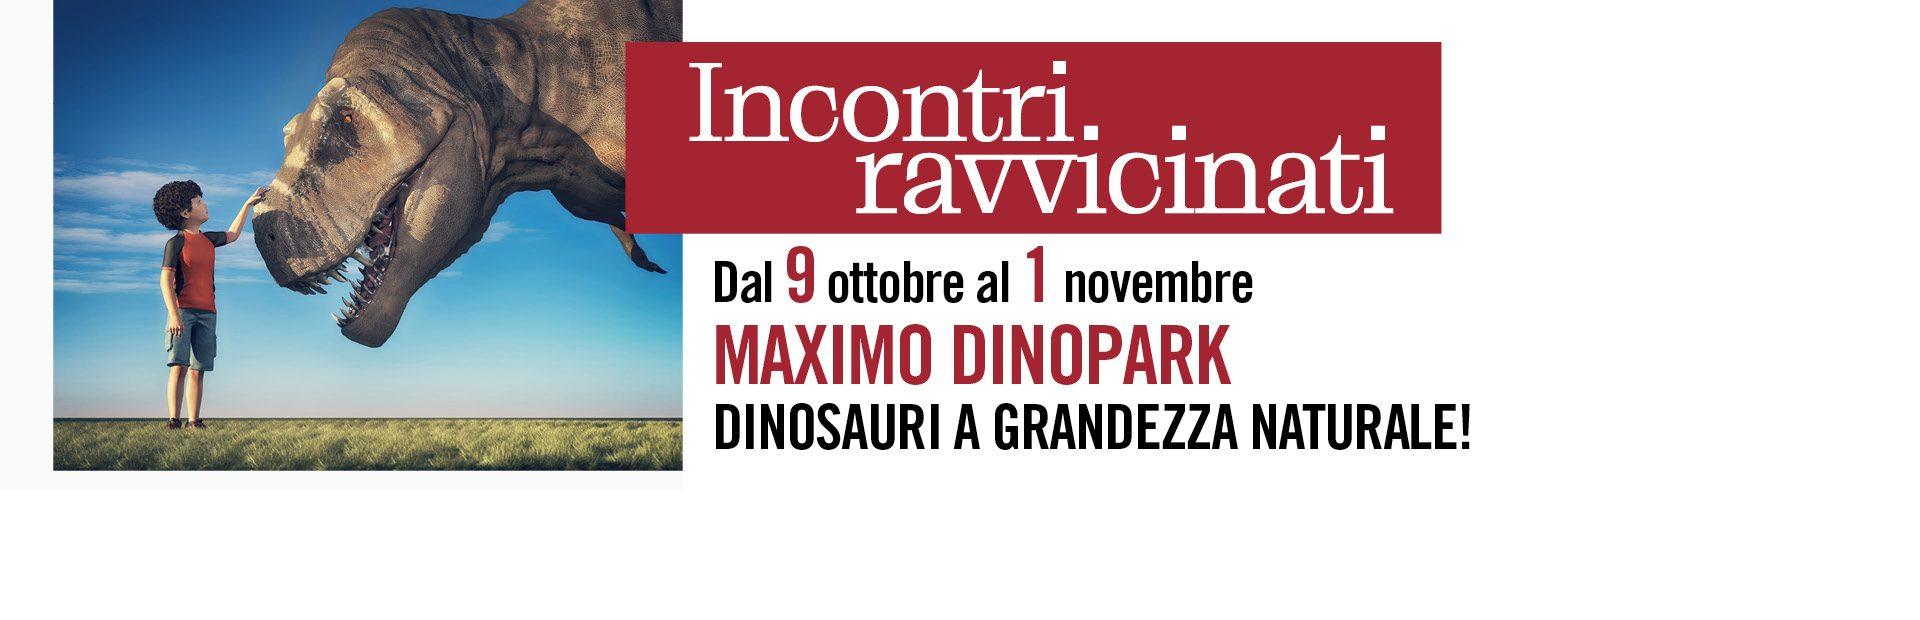 Maximo_Dinosauri_1920x620